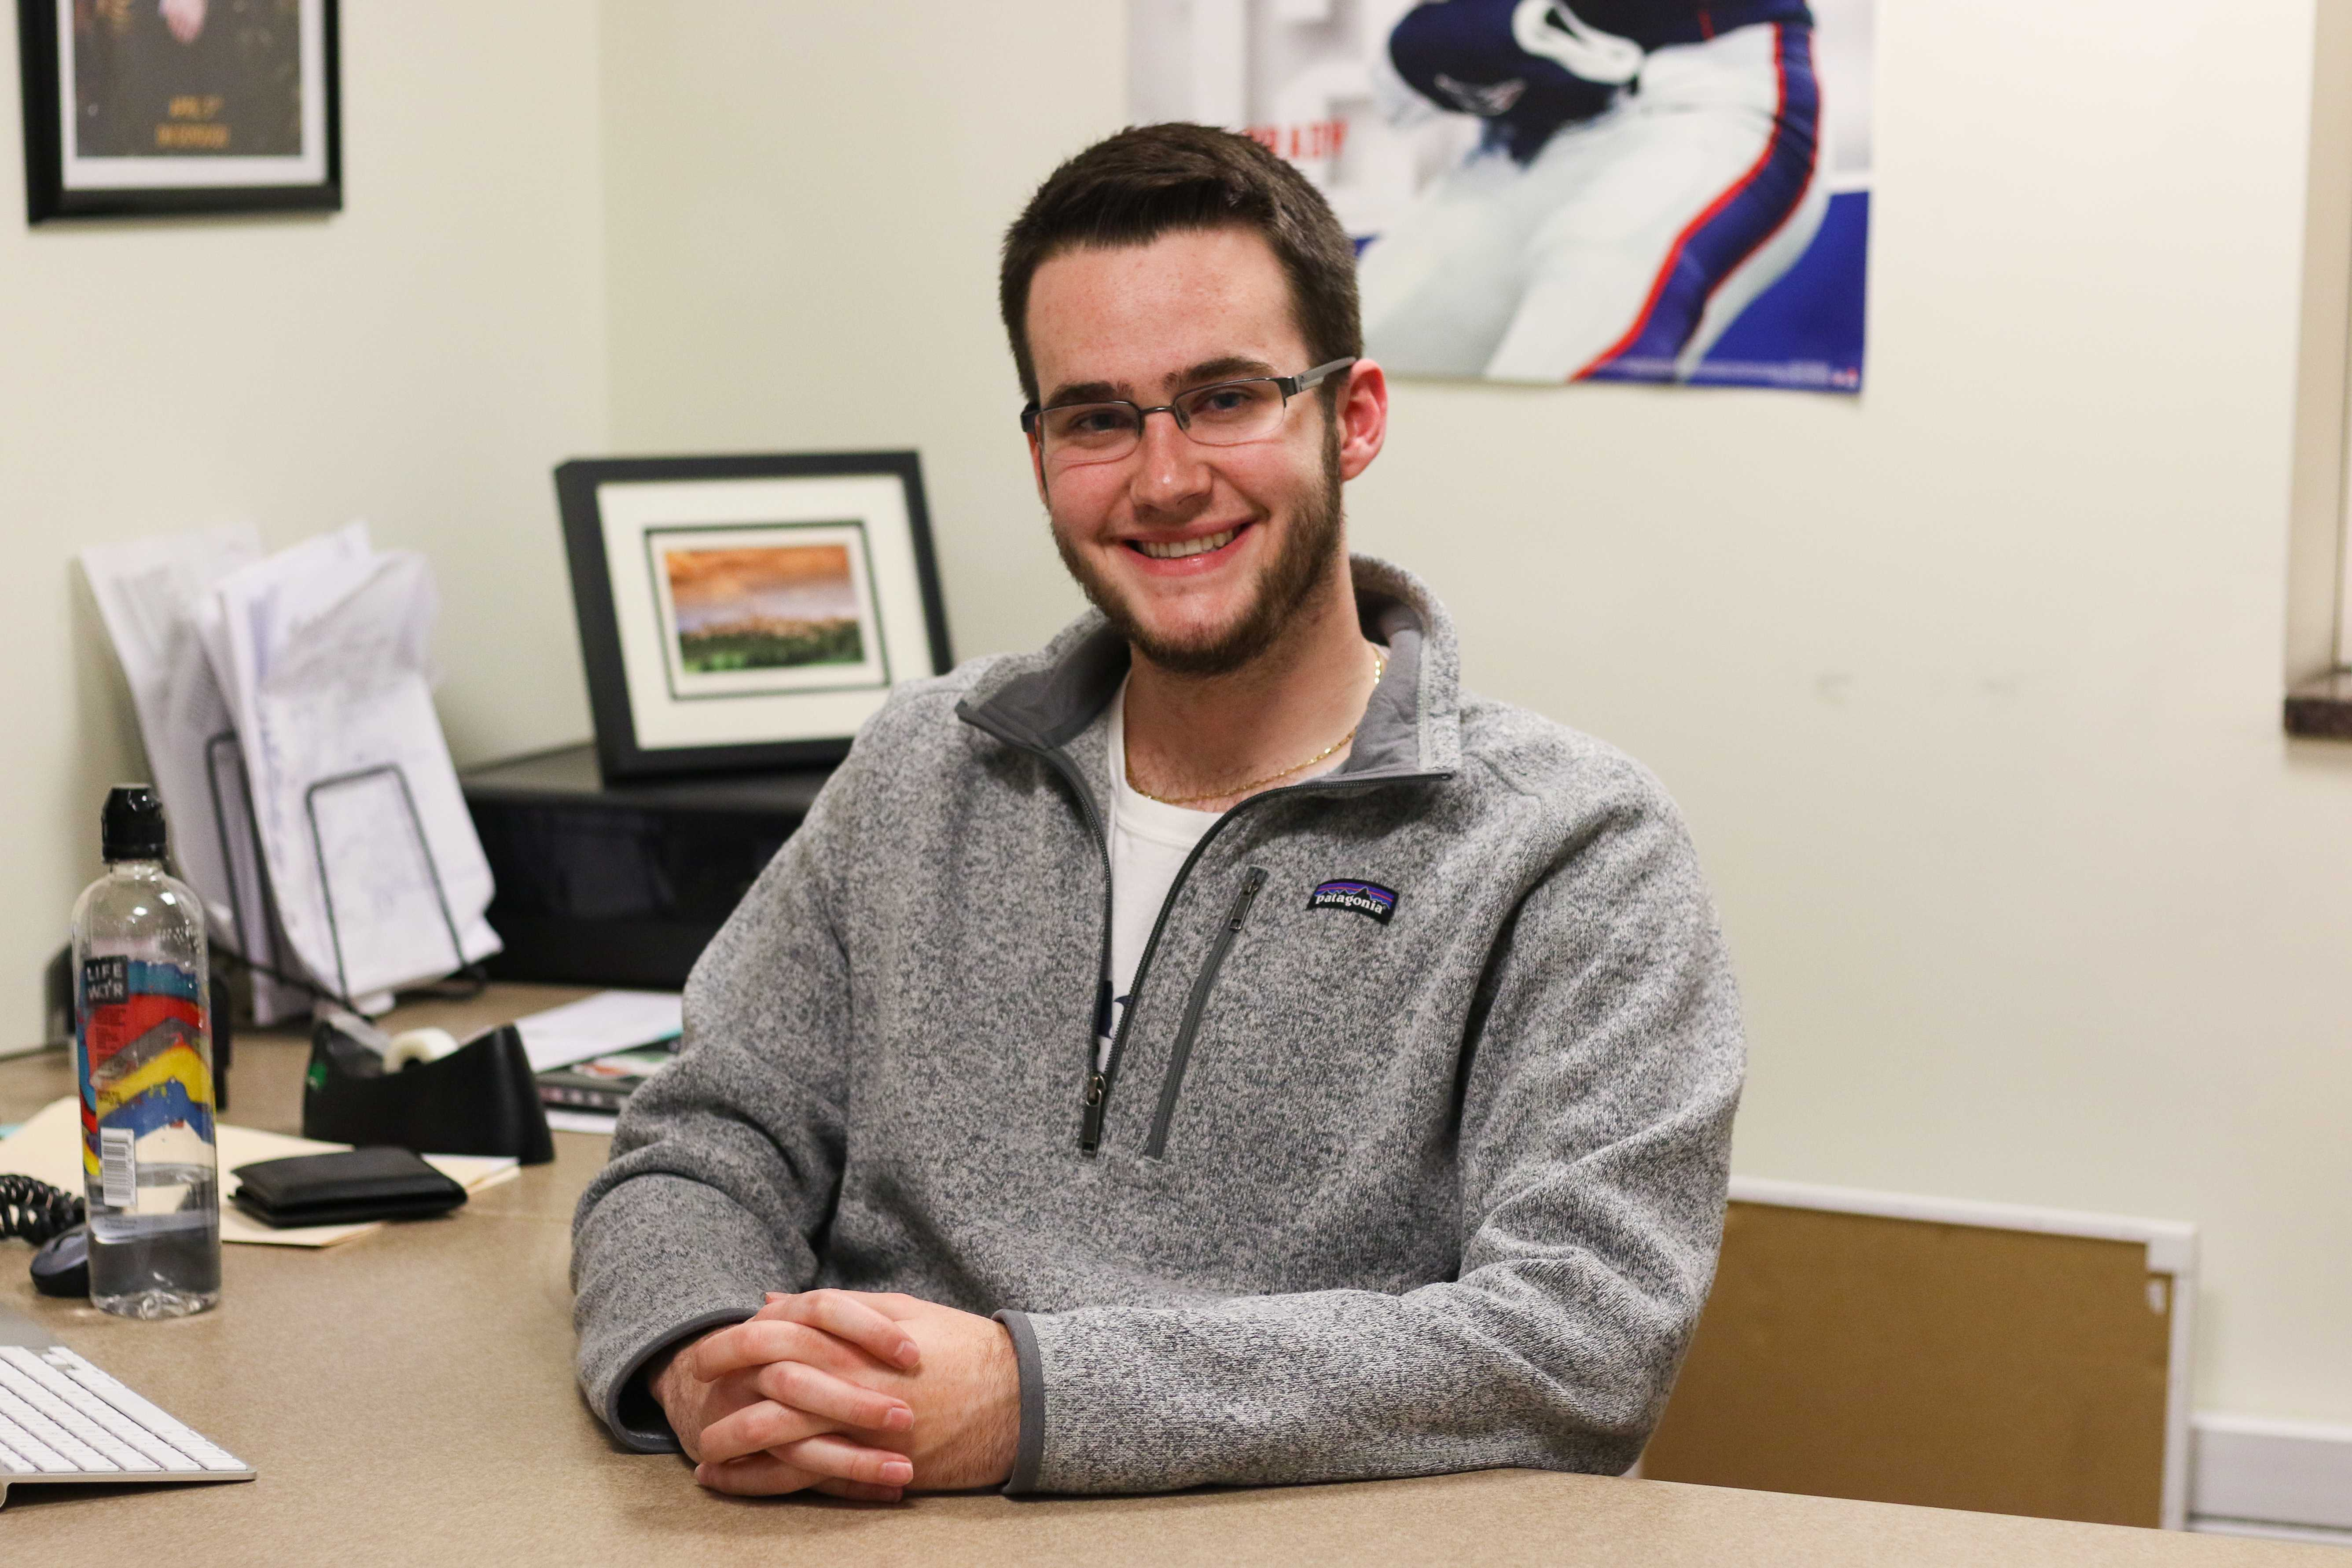 Ryan Hicks appointed SGA President